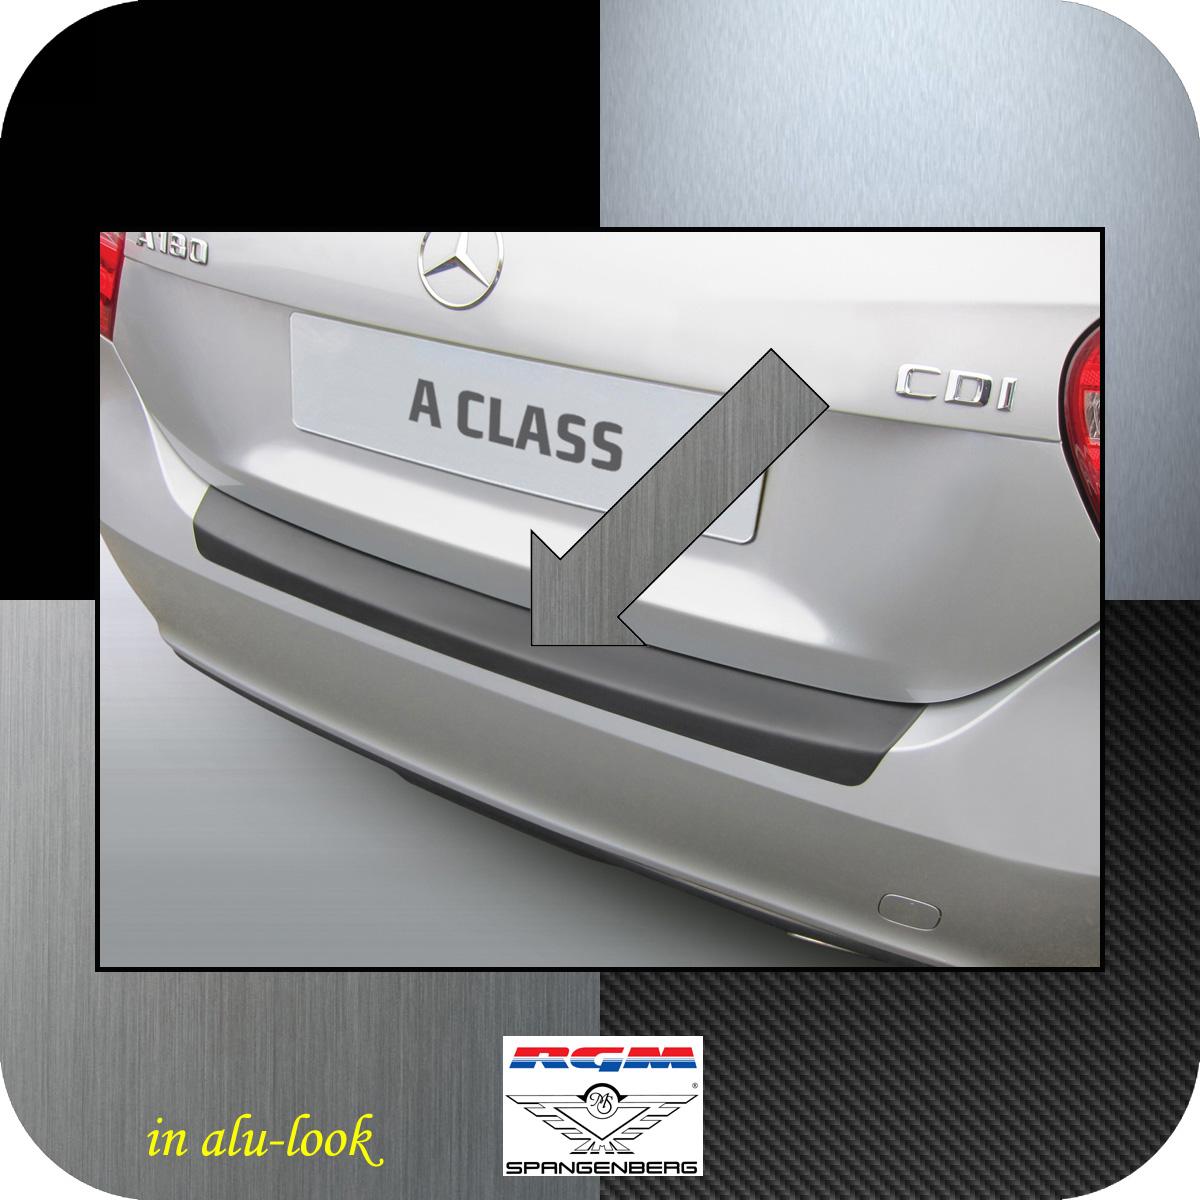 Ladekantenschutz Alu-Look Mercedes Benz A-Klasse W176 Schrägheck 2015- 3504933